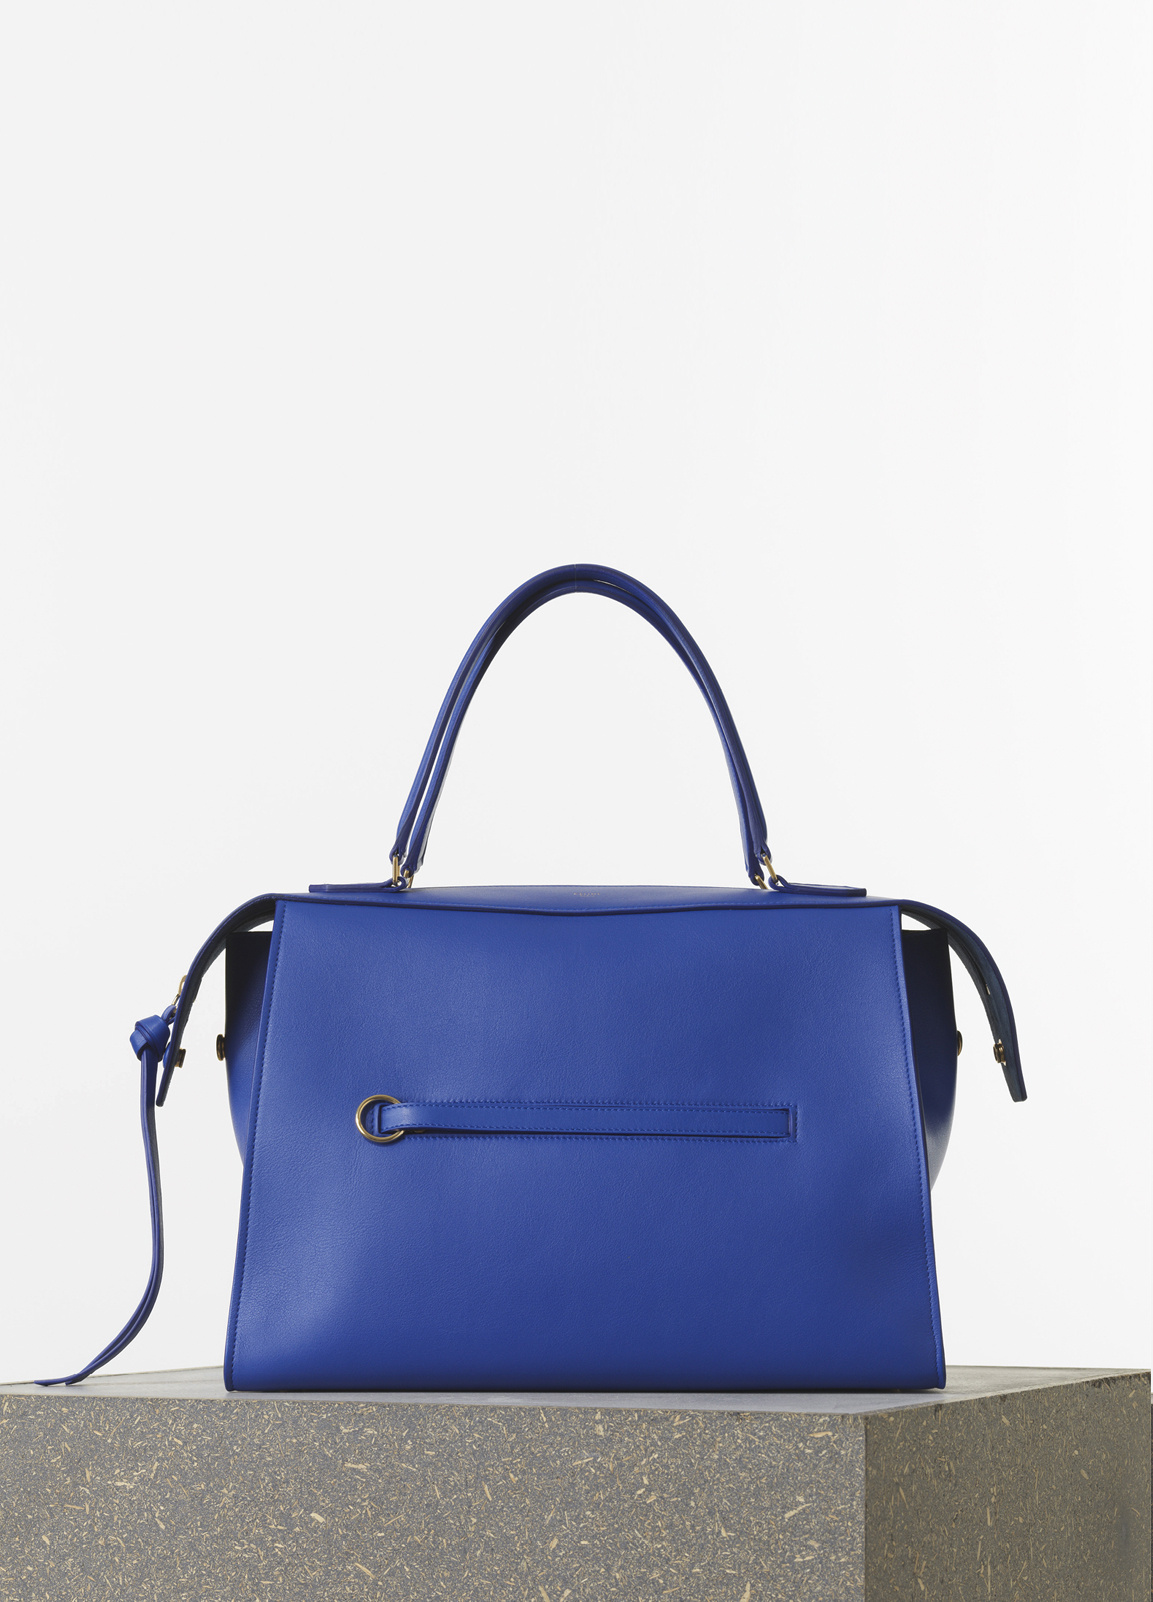 Medium zipped hobo handbag in natural calfskin